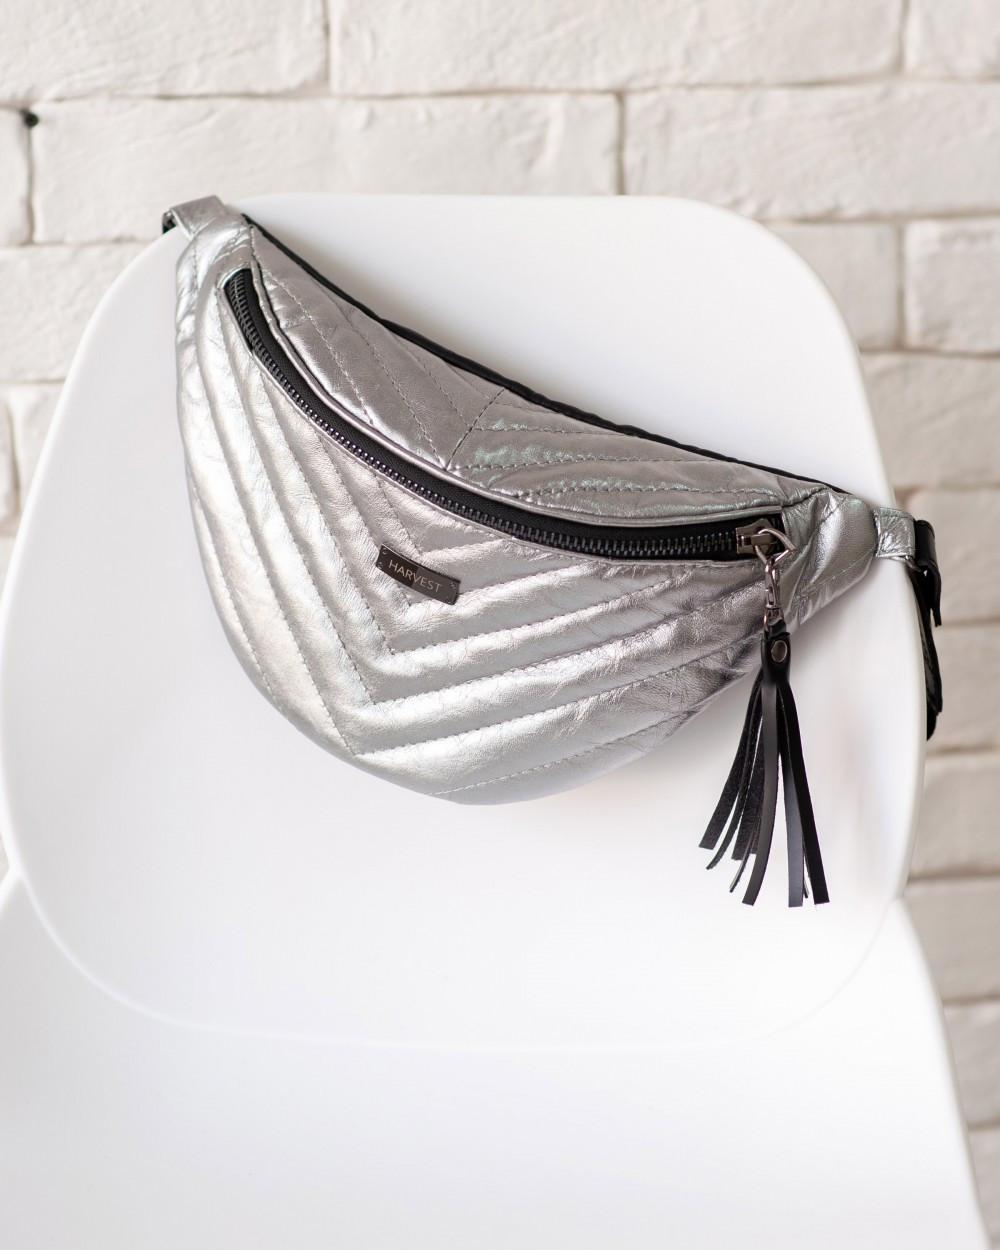 "Женская поясная сумка ""MOLLY"" серебро, на 2л, бананка, повседневная, спортивная, натуральная кожа, Harvest"